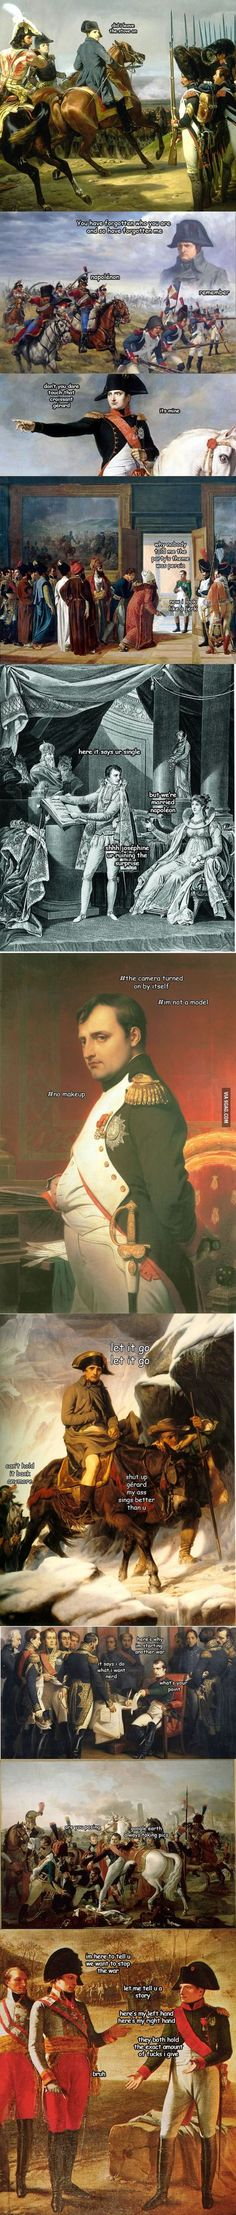 The Adventures of Napoléon Bonaparte: